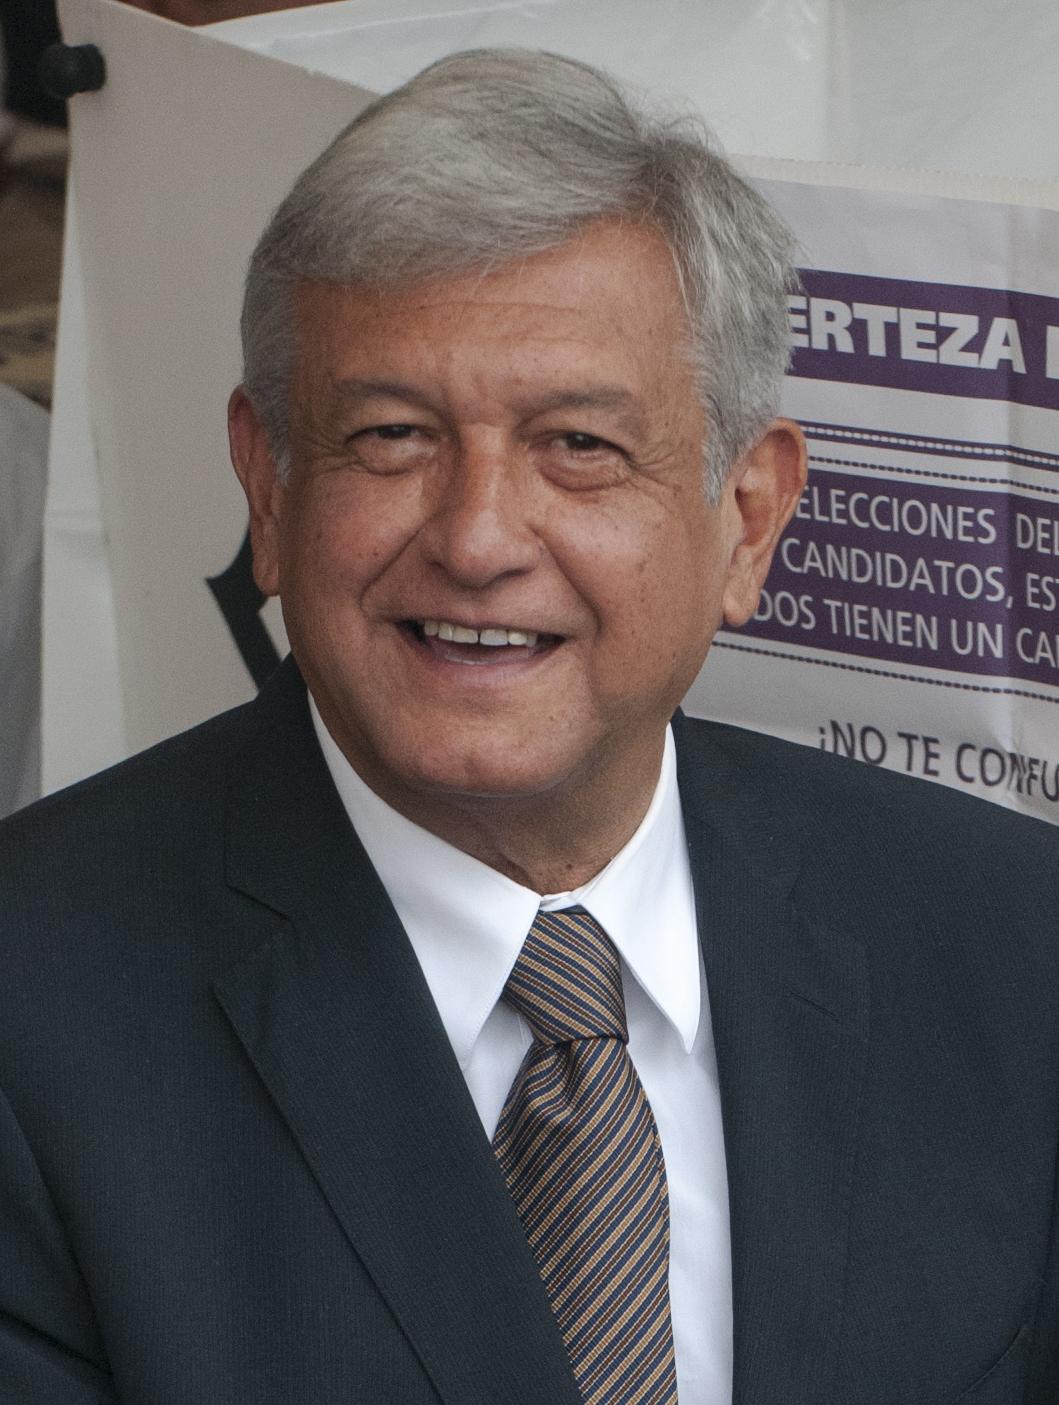 Mexico Presidential Election Results Meet AntiTrump